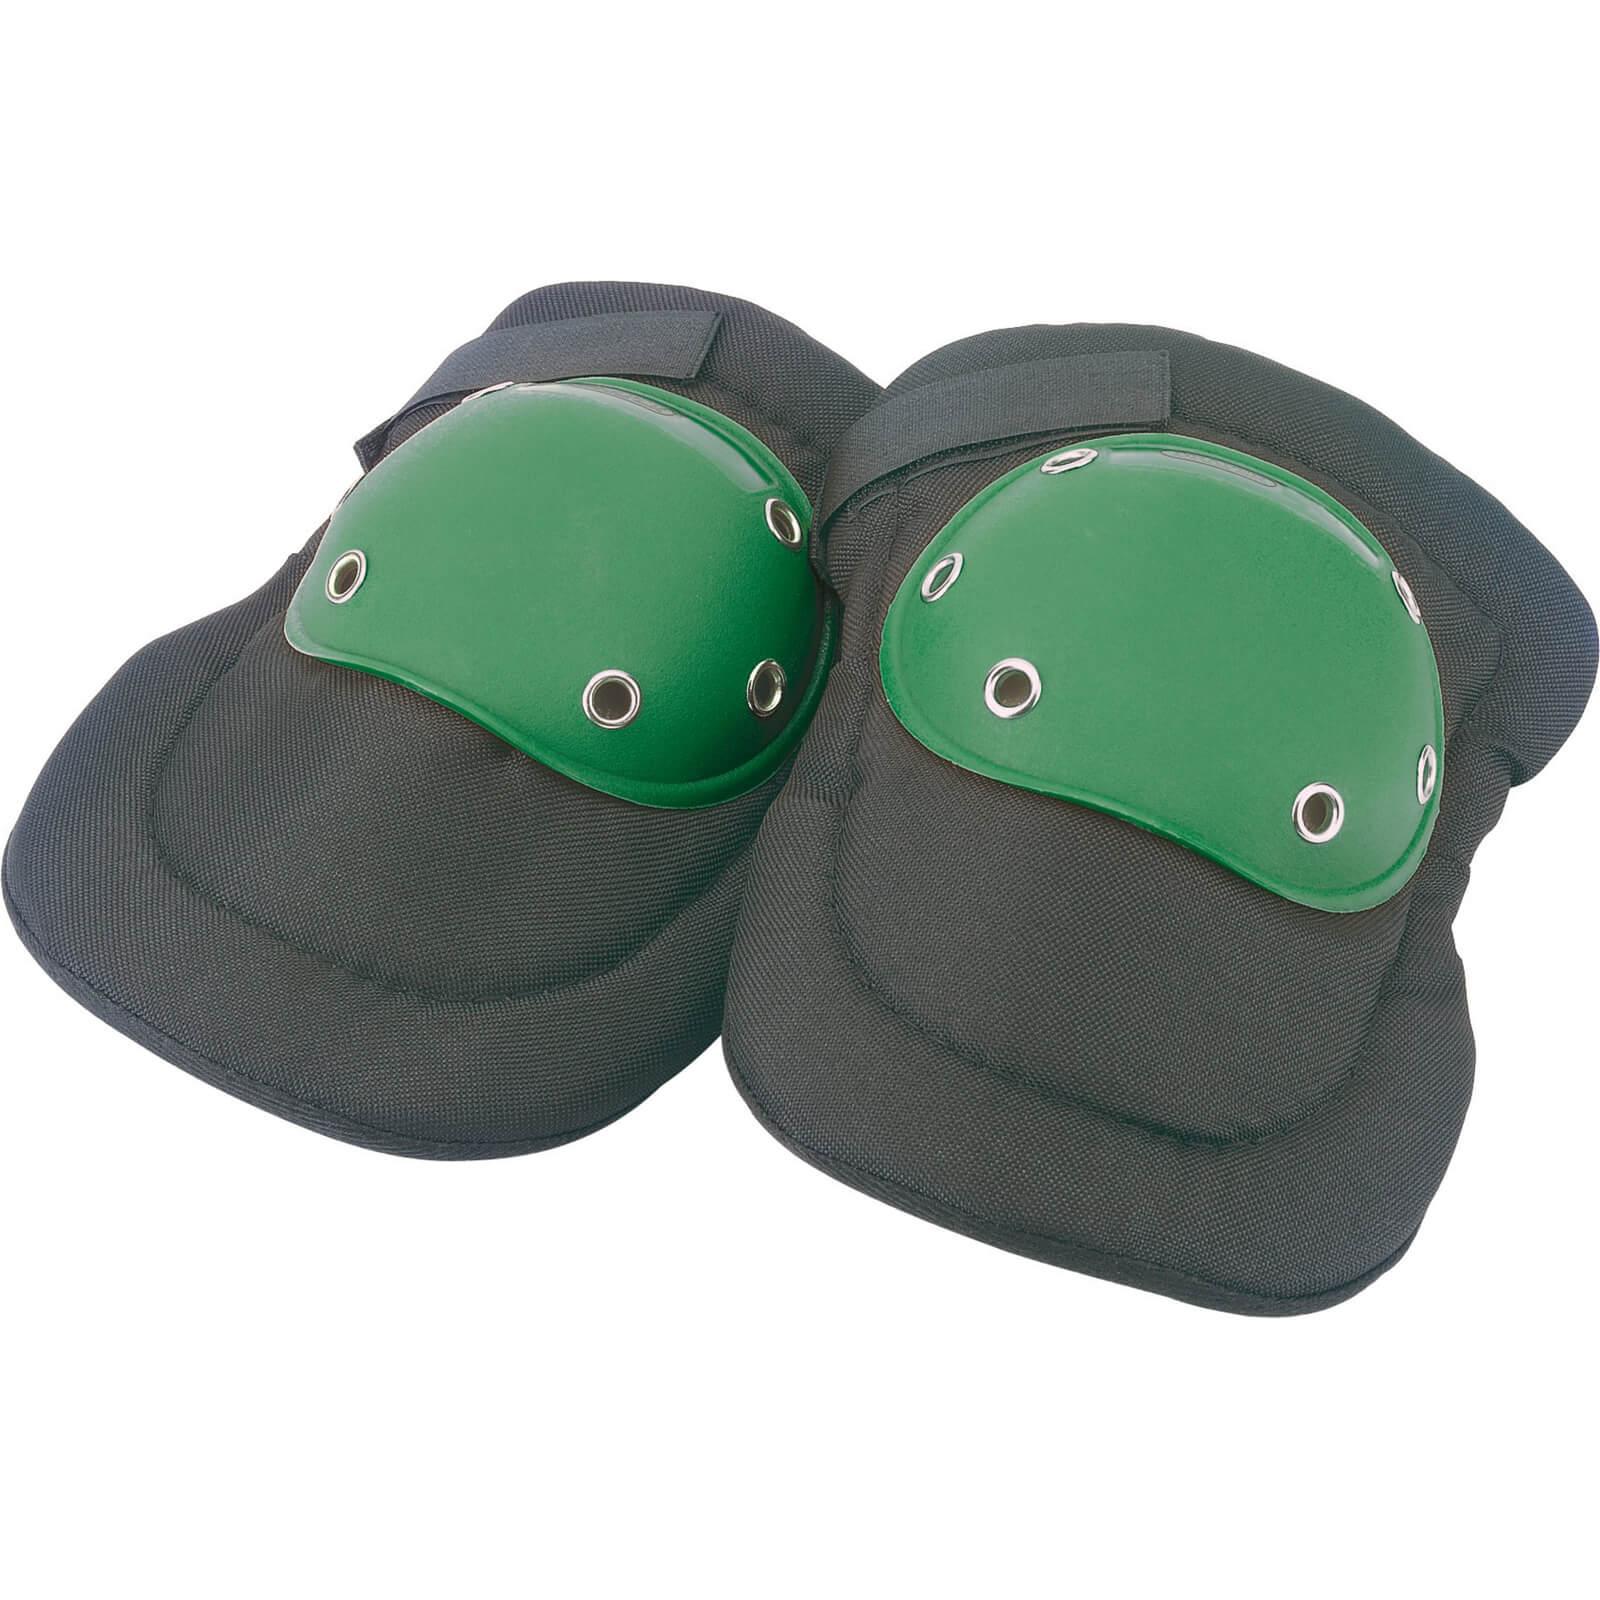 Draper Foam Knee Pads